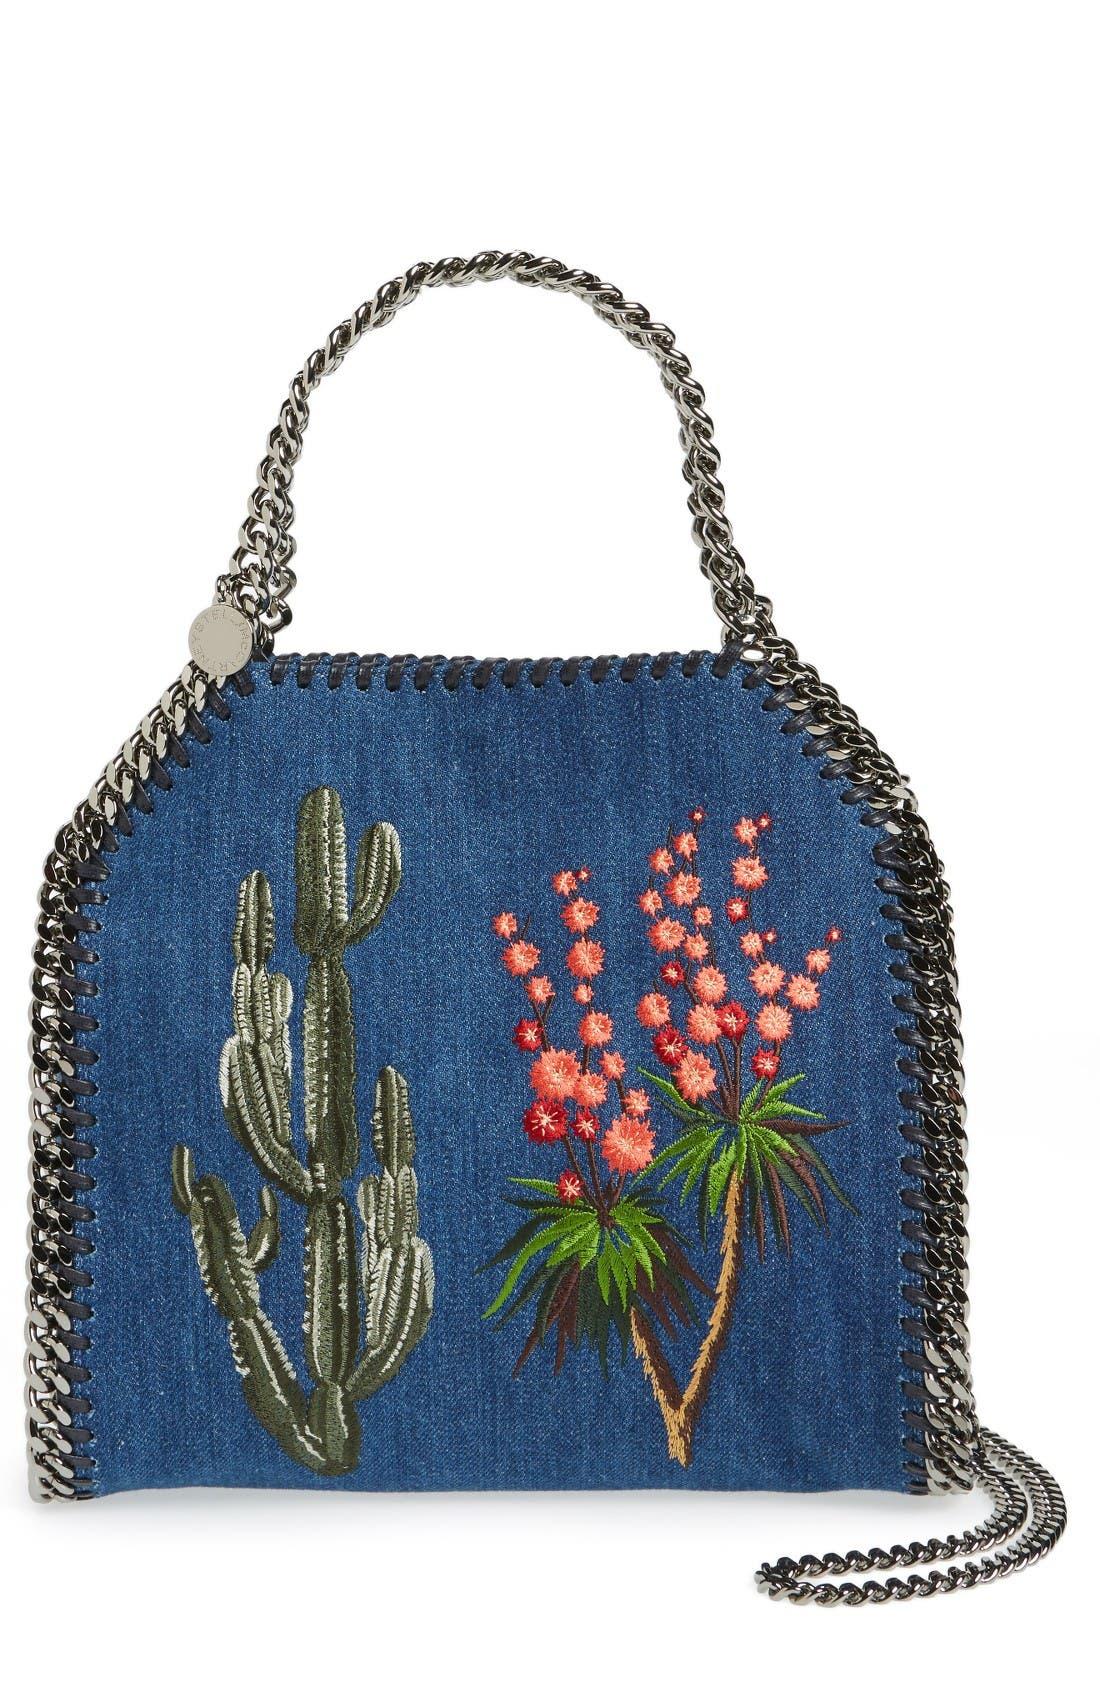 Alternate Image 1 Selected - Stella McCartney Mini Falabella Embroidered Denim Tote